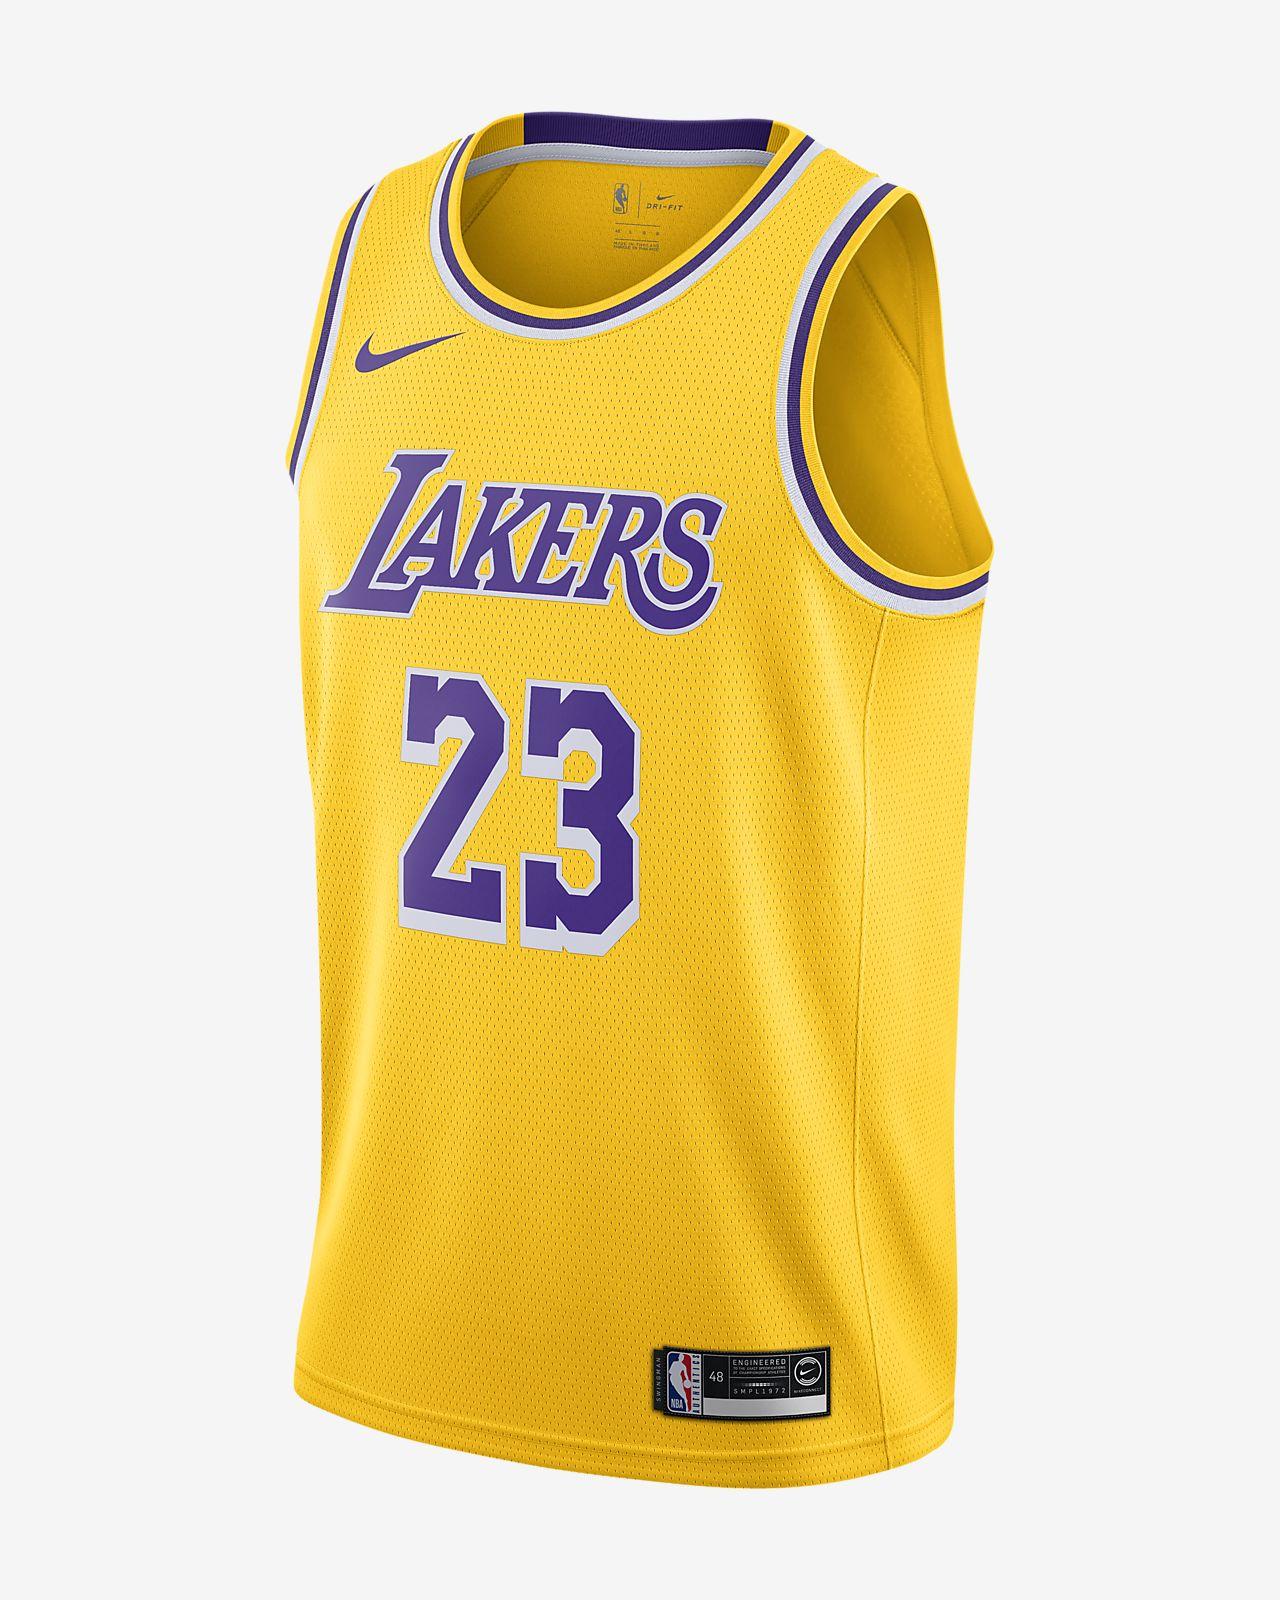 Maillot d'équipe Nike NBA Swingman LeBron James Lakers Icon Edition